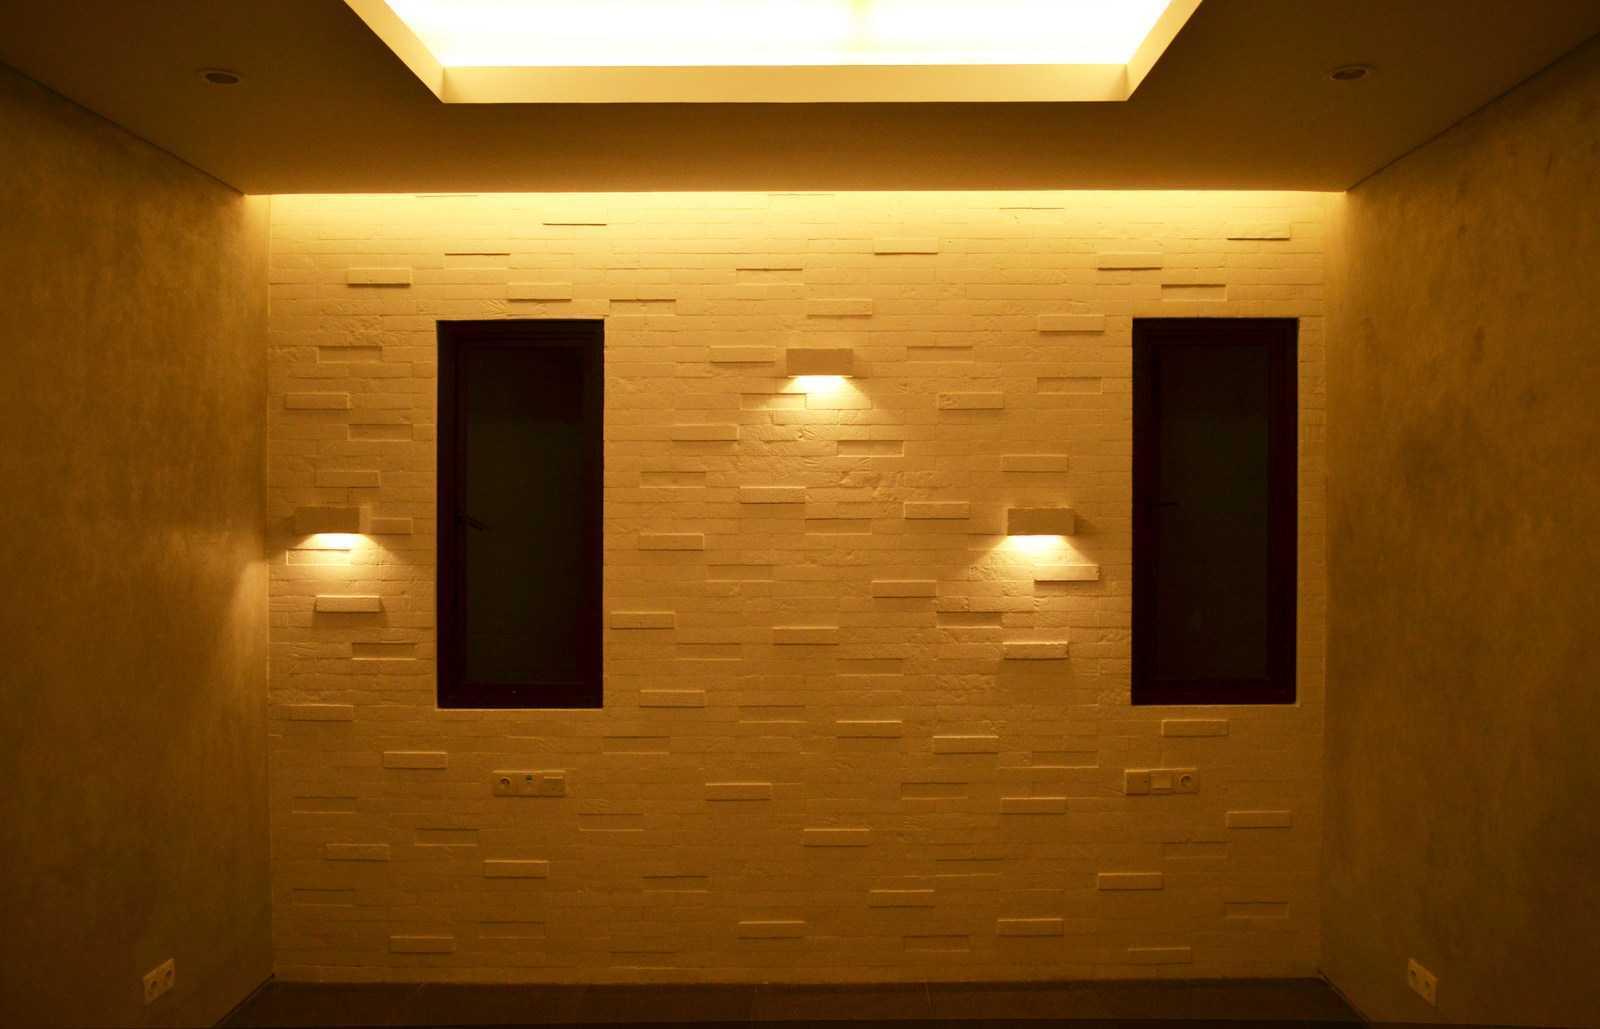 X3M Architects Nittaya A3 15 House Bsd Bsd Interior - Wall   25300